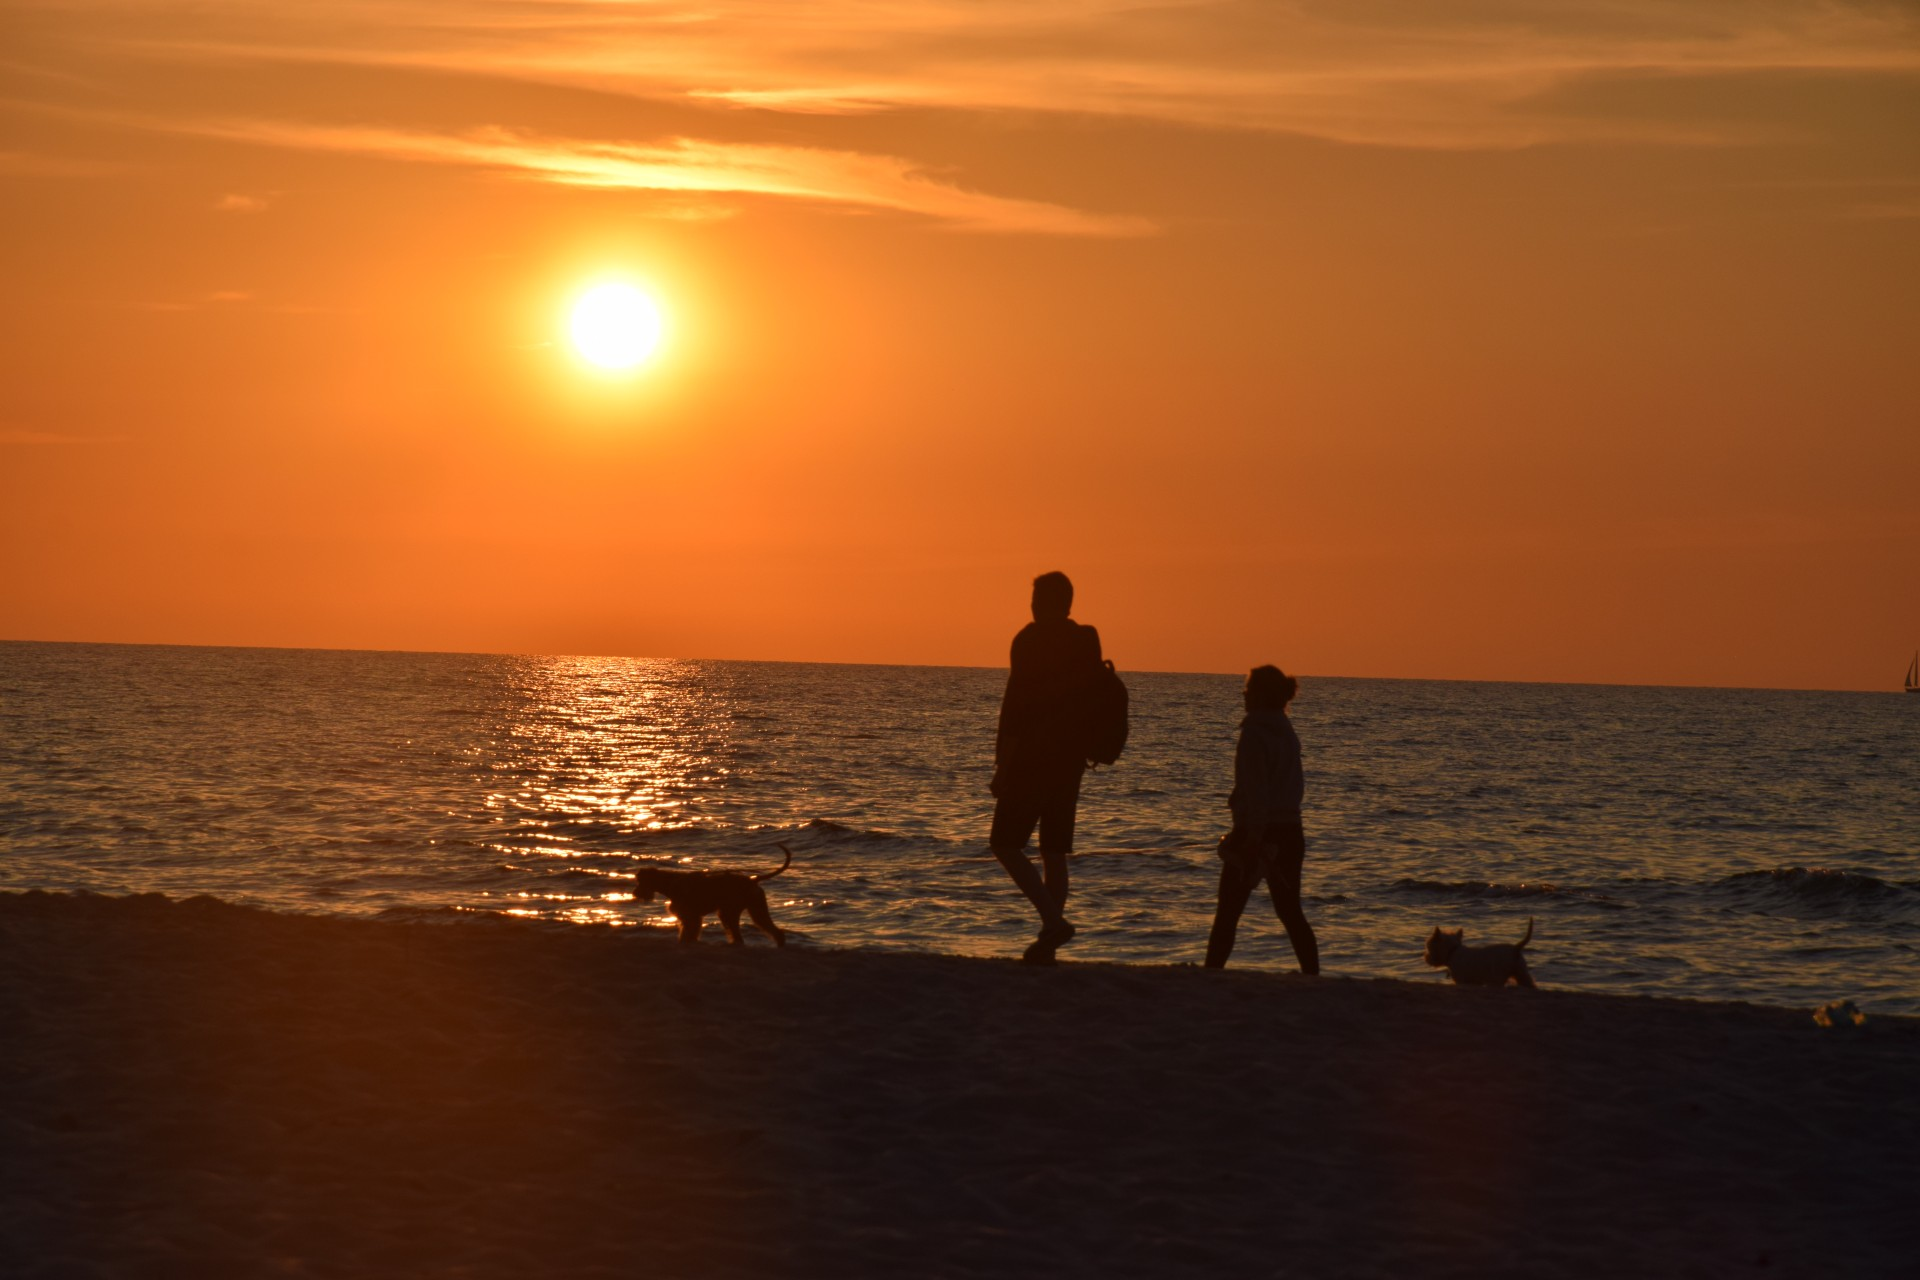 Kopalino, plaża. Nieopowiedziane historie [FOTOREPORTAŻ] 6